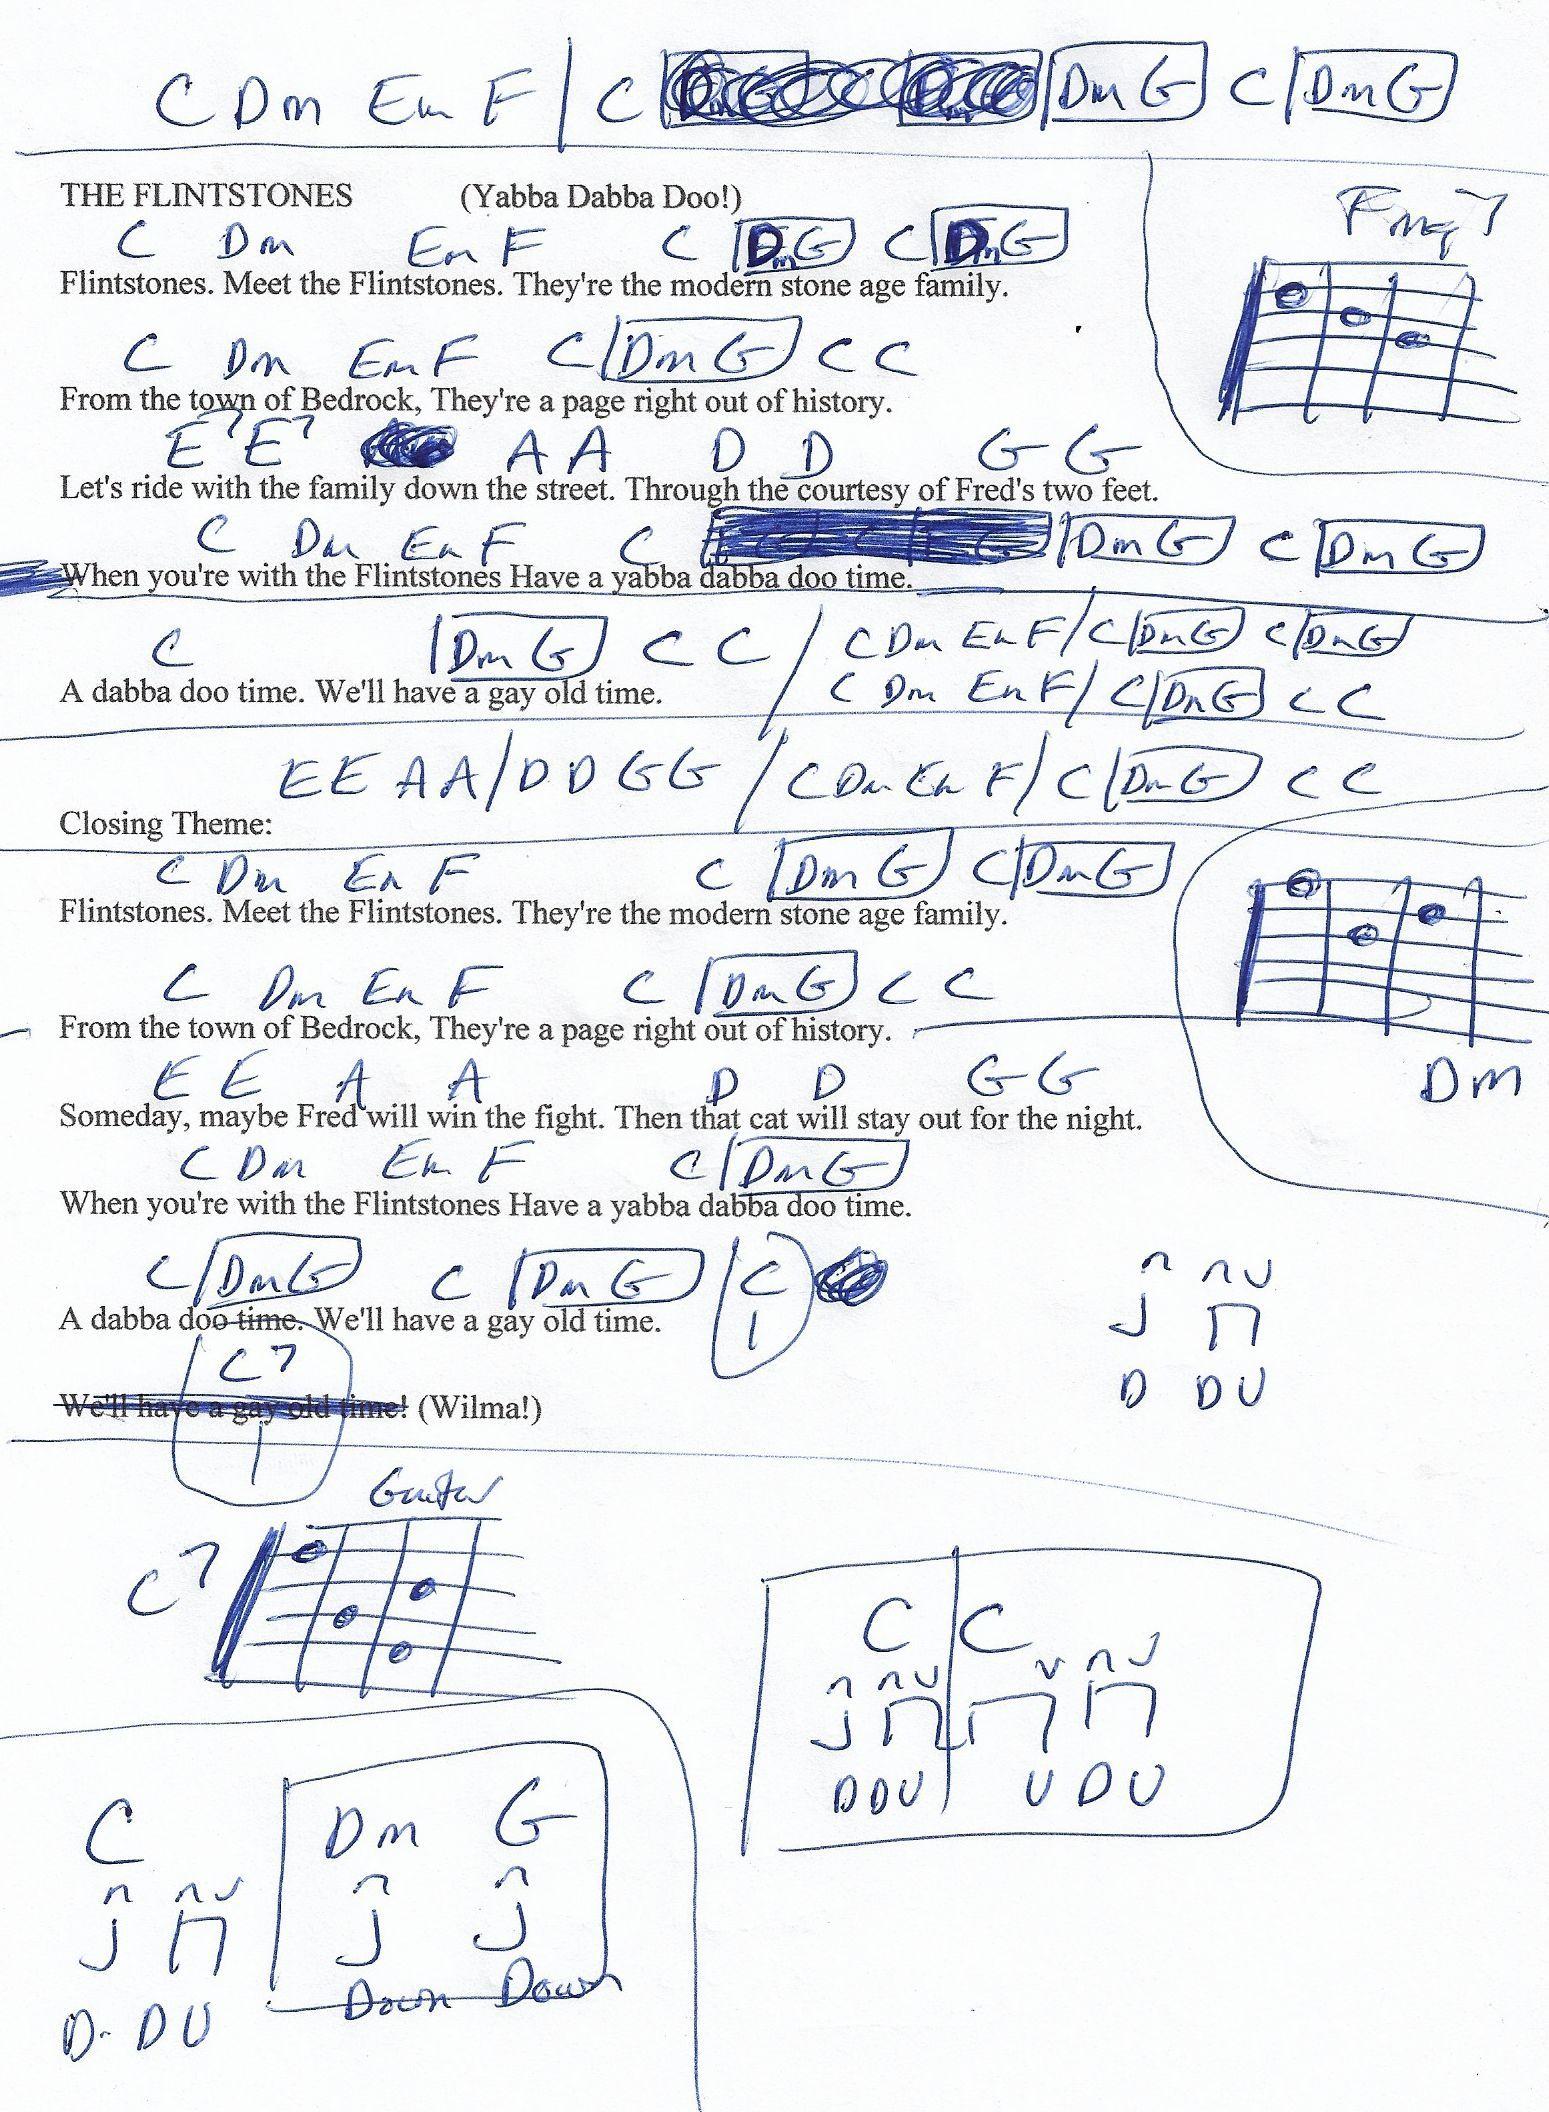 The flintstones tv theme guitar chord chart munson arrangement the flintstones tv theme guitar chord chart munson arrangement hexwebz Images